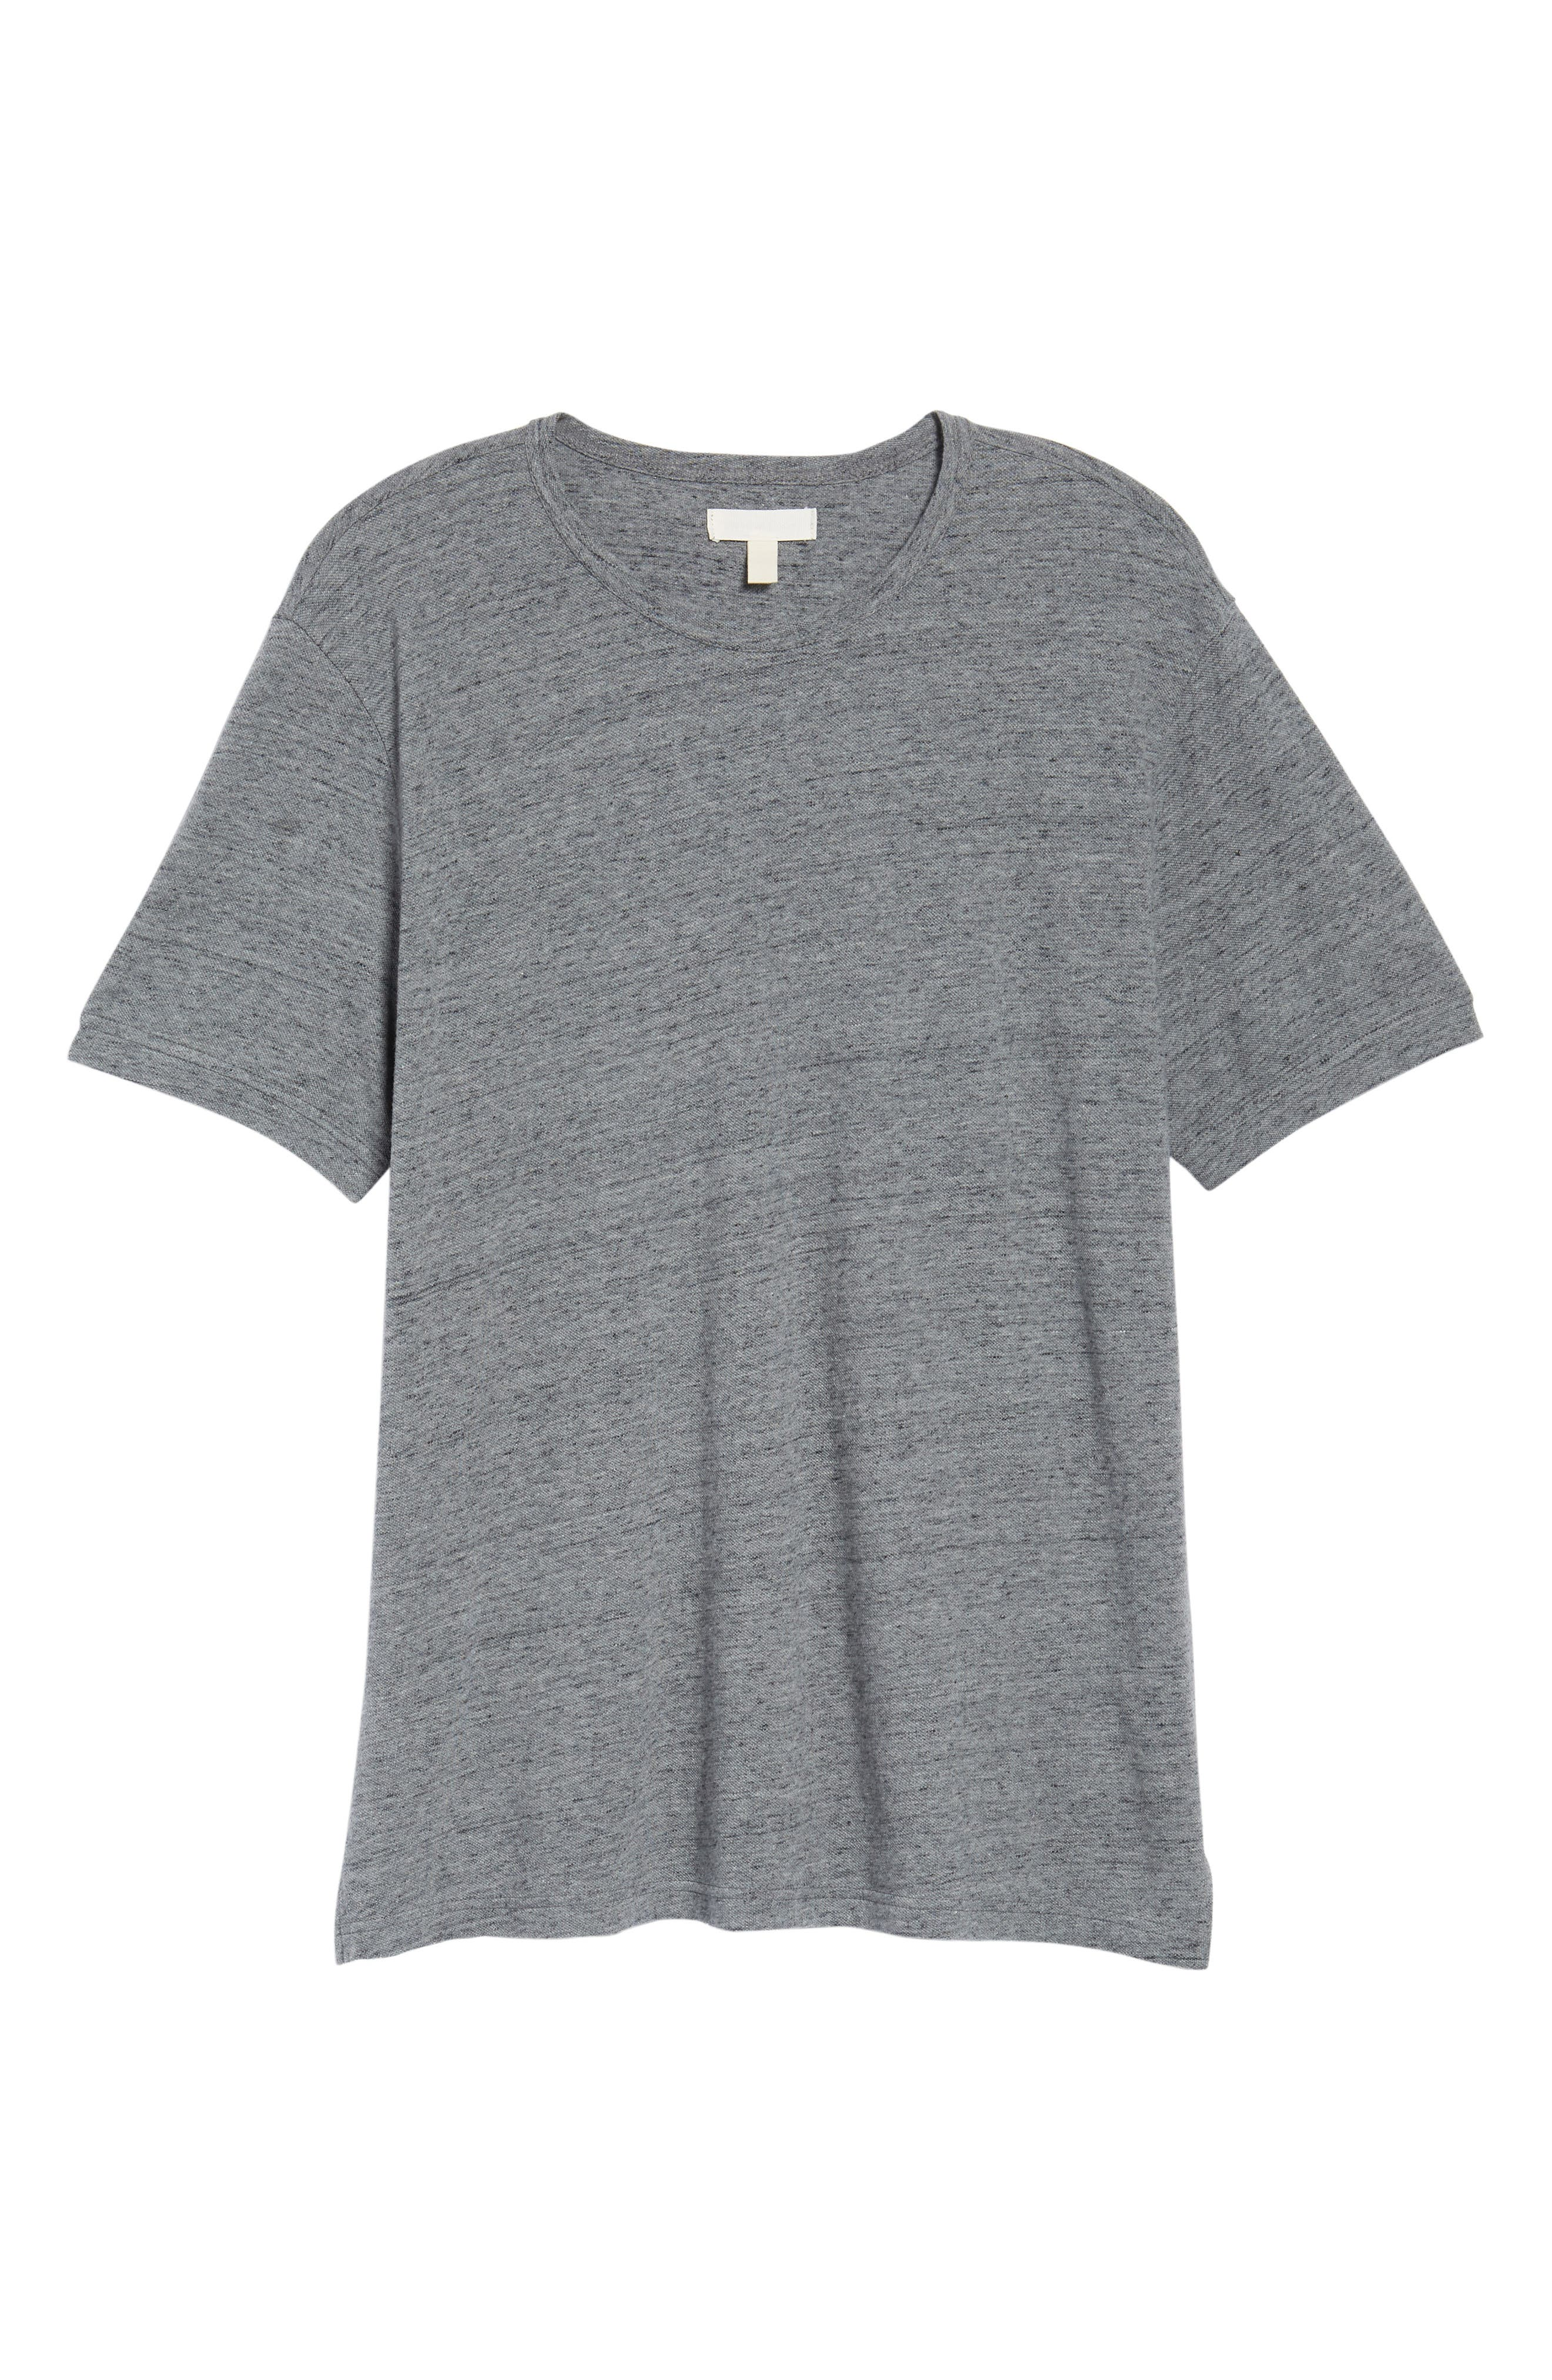 THE RAIL,                             Piqué T-Shirt,                             Alternate thumbnail 6, color,                             030